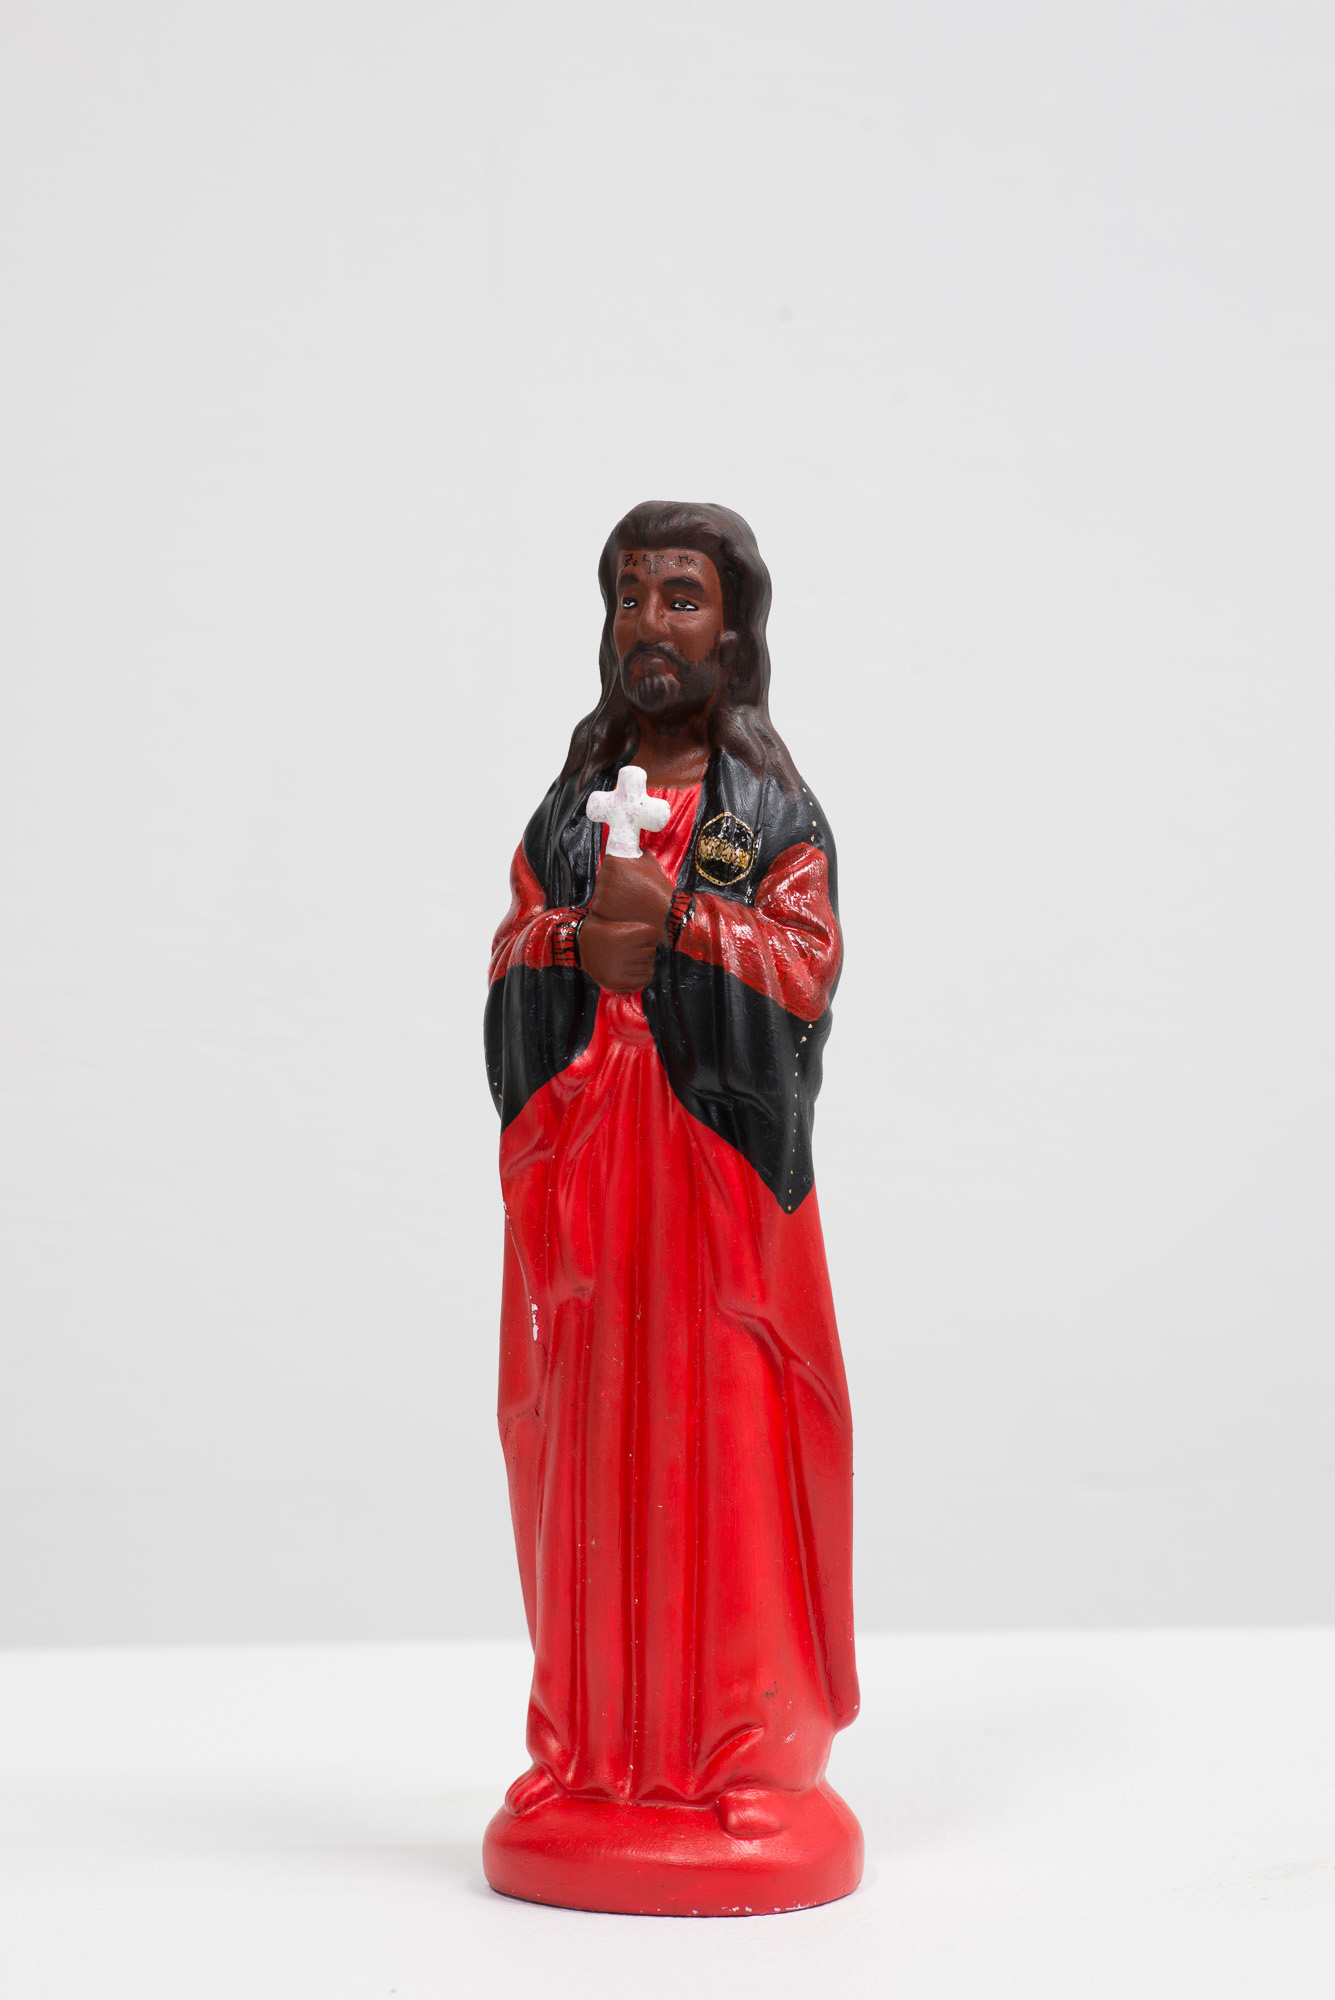 Kei whea ngā Atua o mua? Ko wai ngā Atua o naianei? /Where are our old Gods? Who are our Gods now? -Pataka (installation)  2015  Acrylic on found ceramic object  Dimensions vary